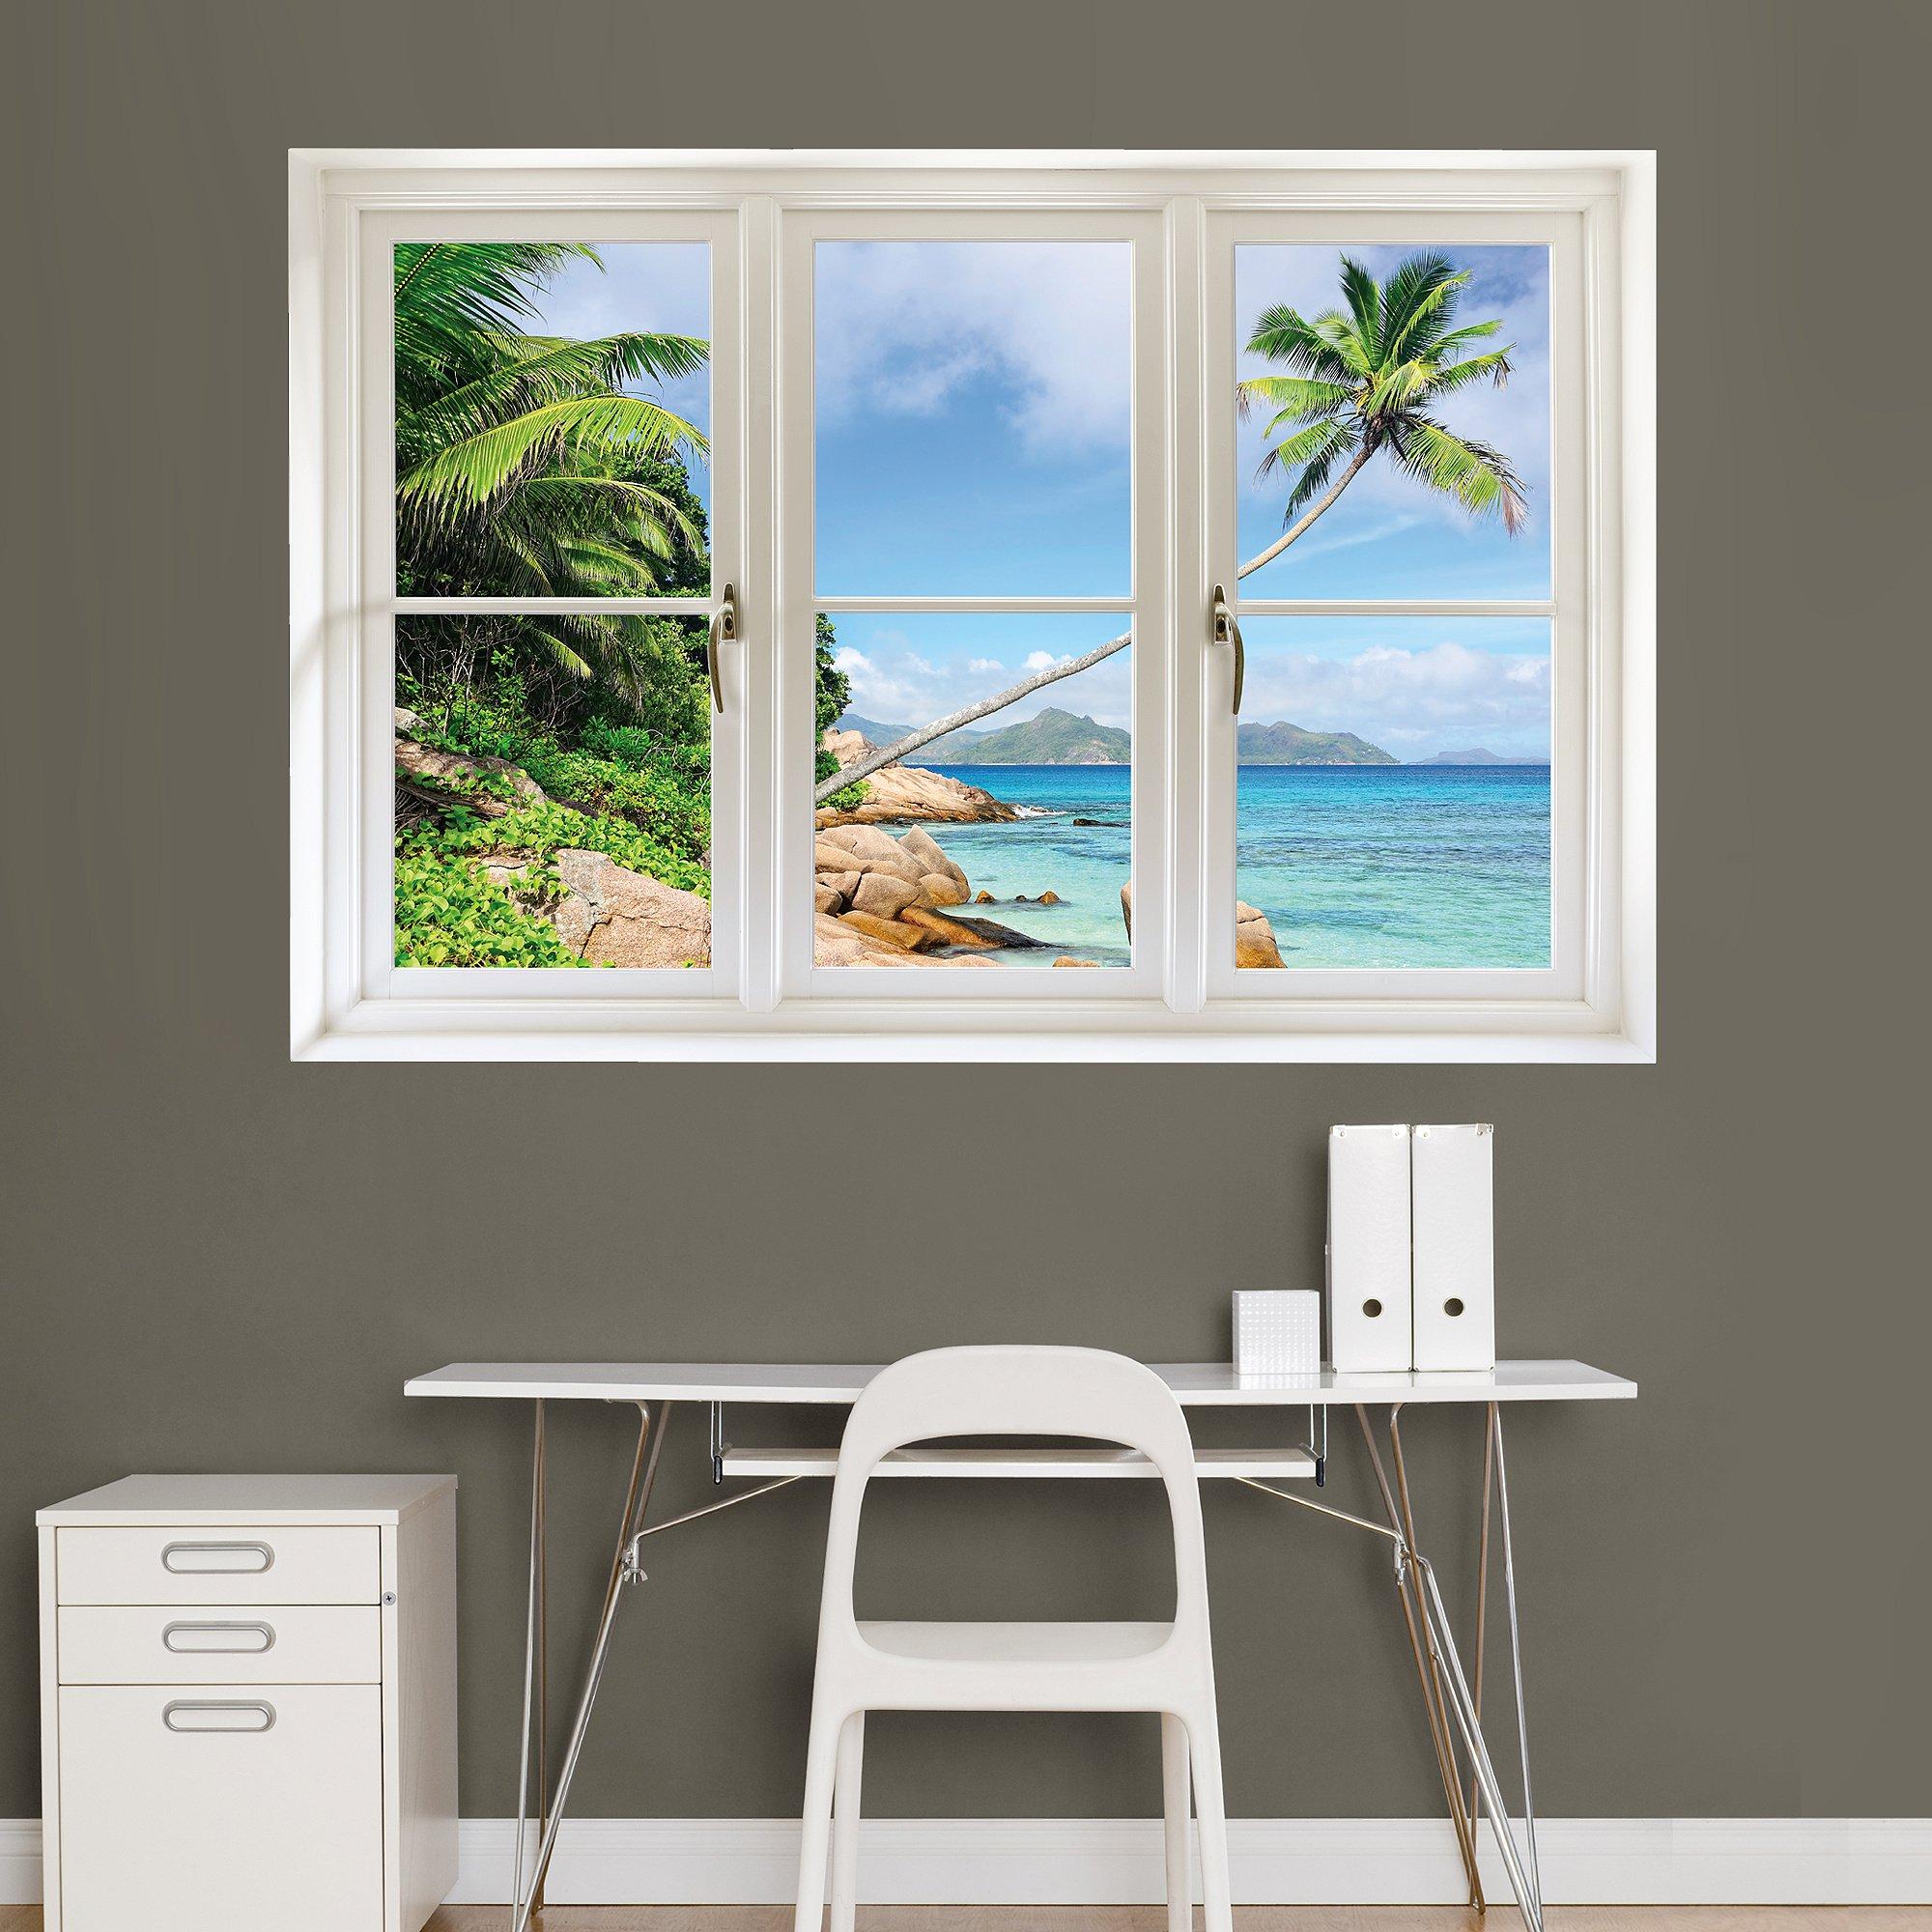 Fathead Wall Decal, ''Tropical Beach, Seychelles Instant Window''